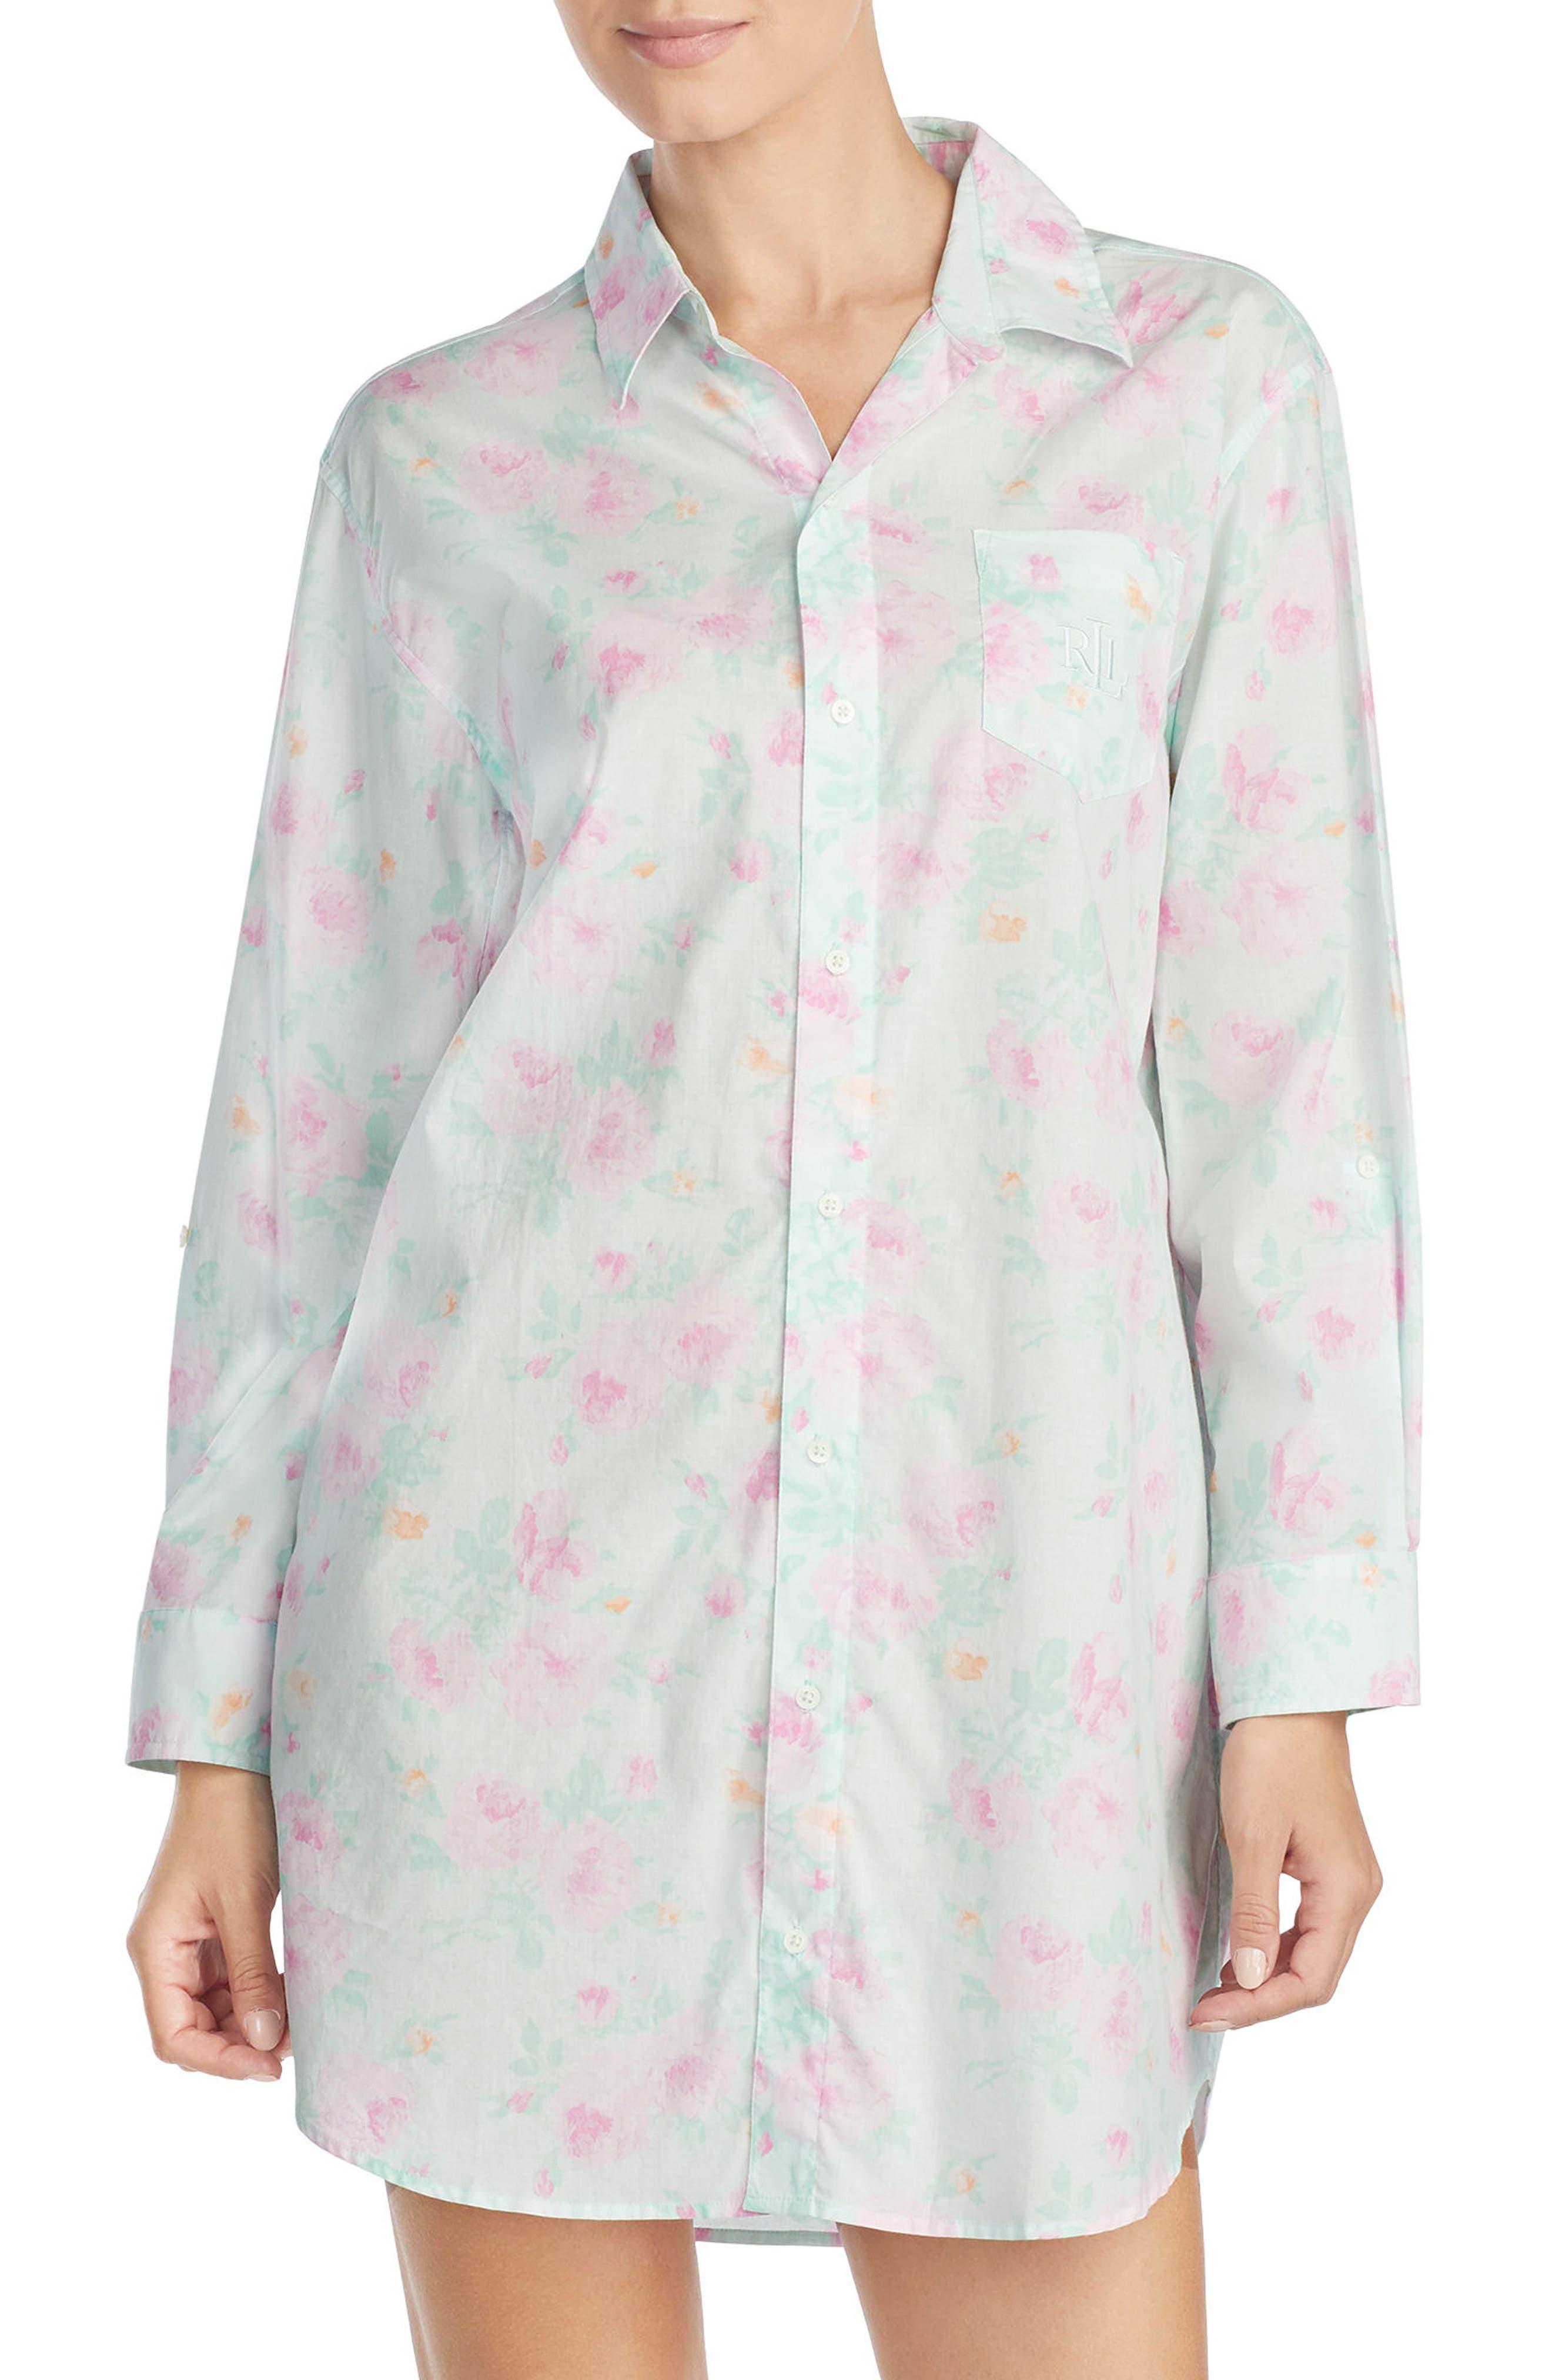 Print Sleep Shirt,                             Main thumbnail 1, color,                             Mint/ Pink Flower